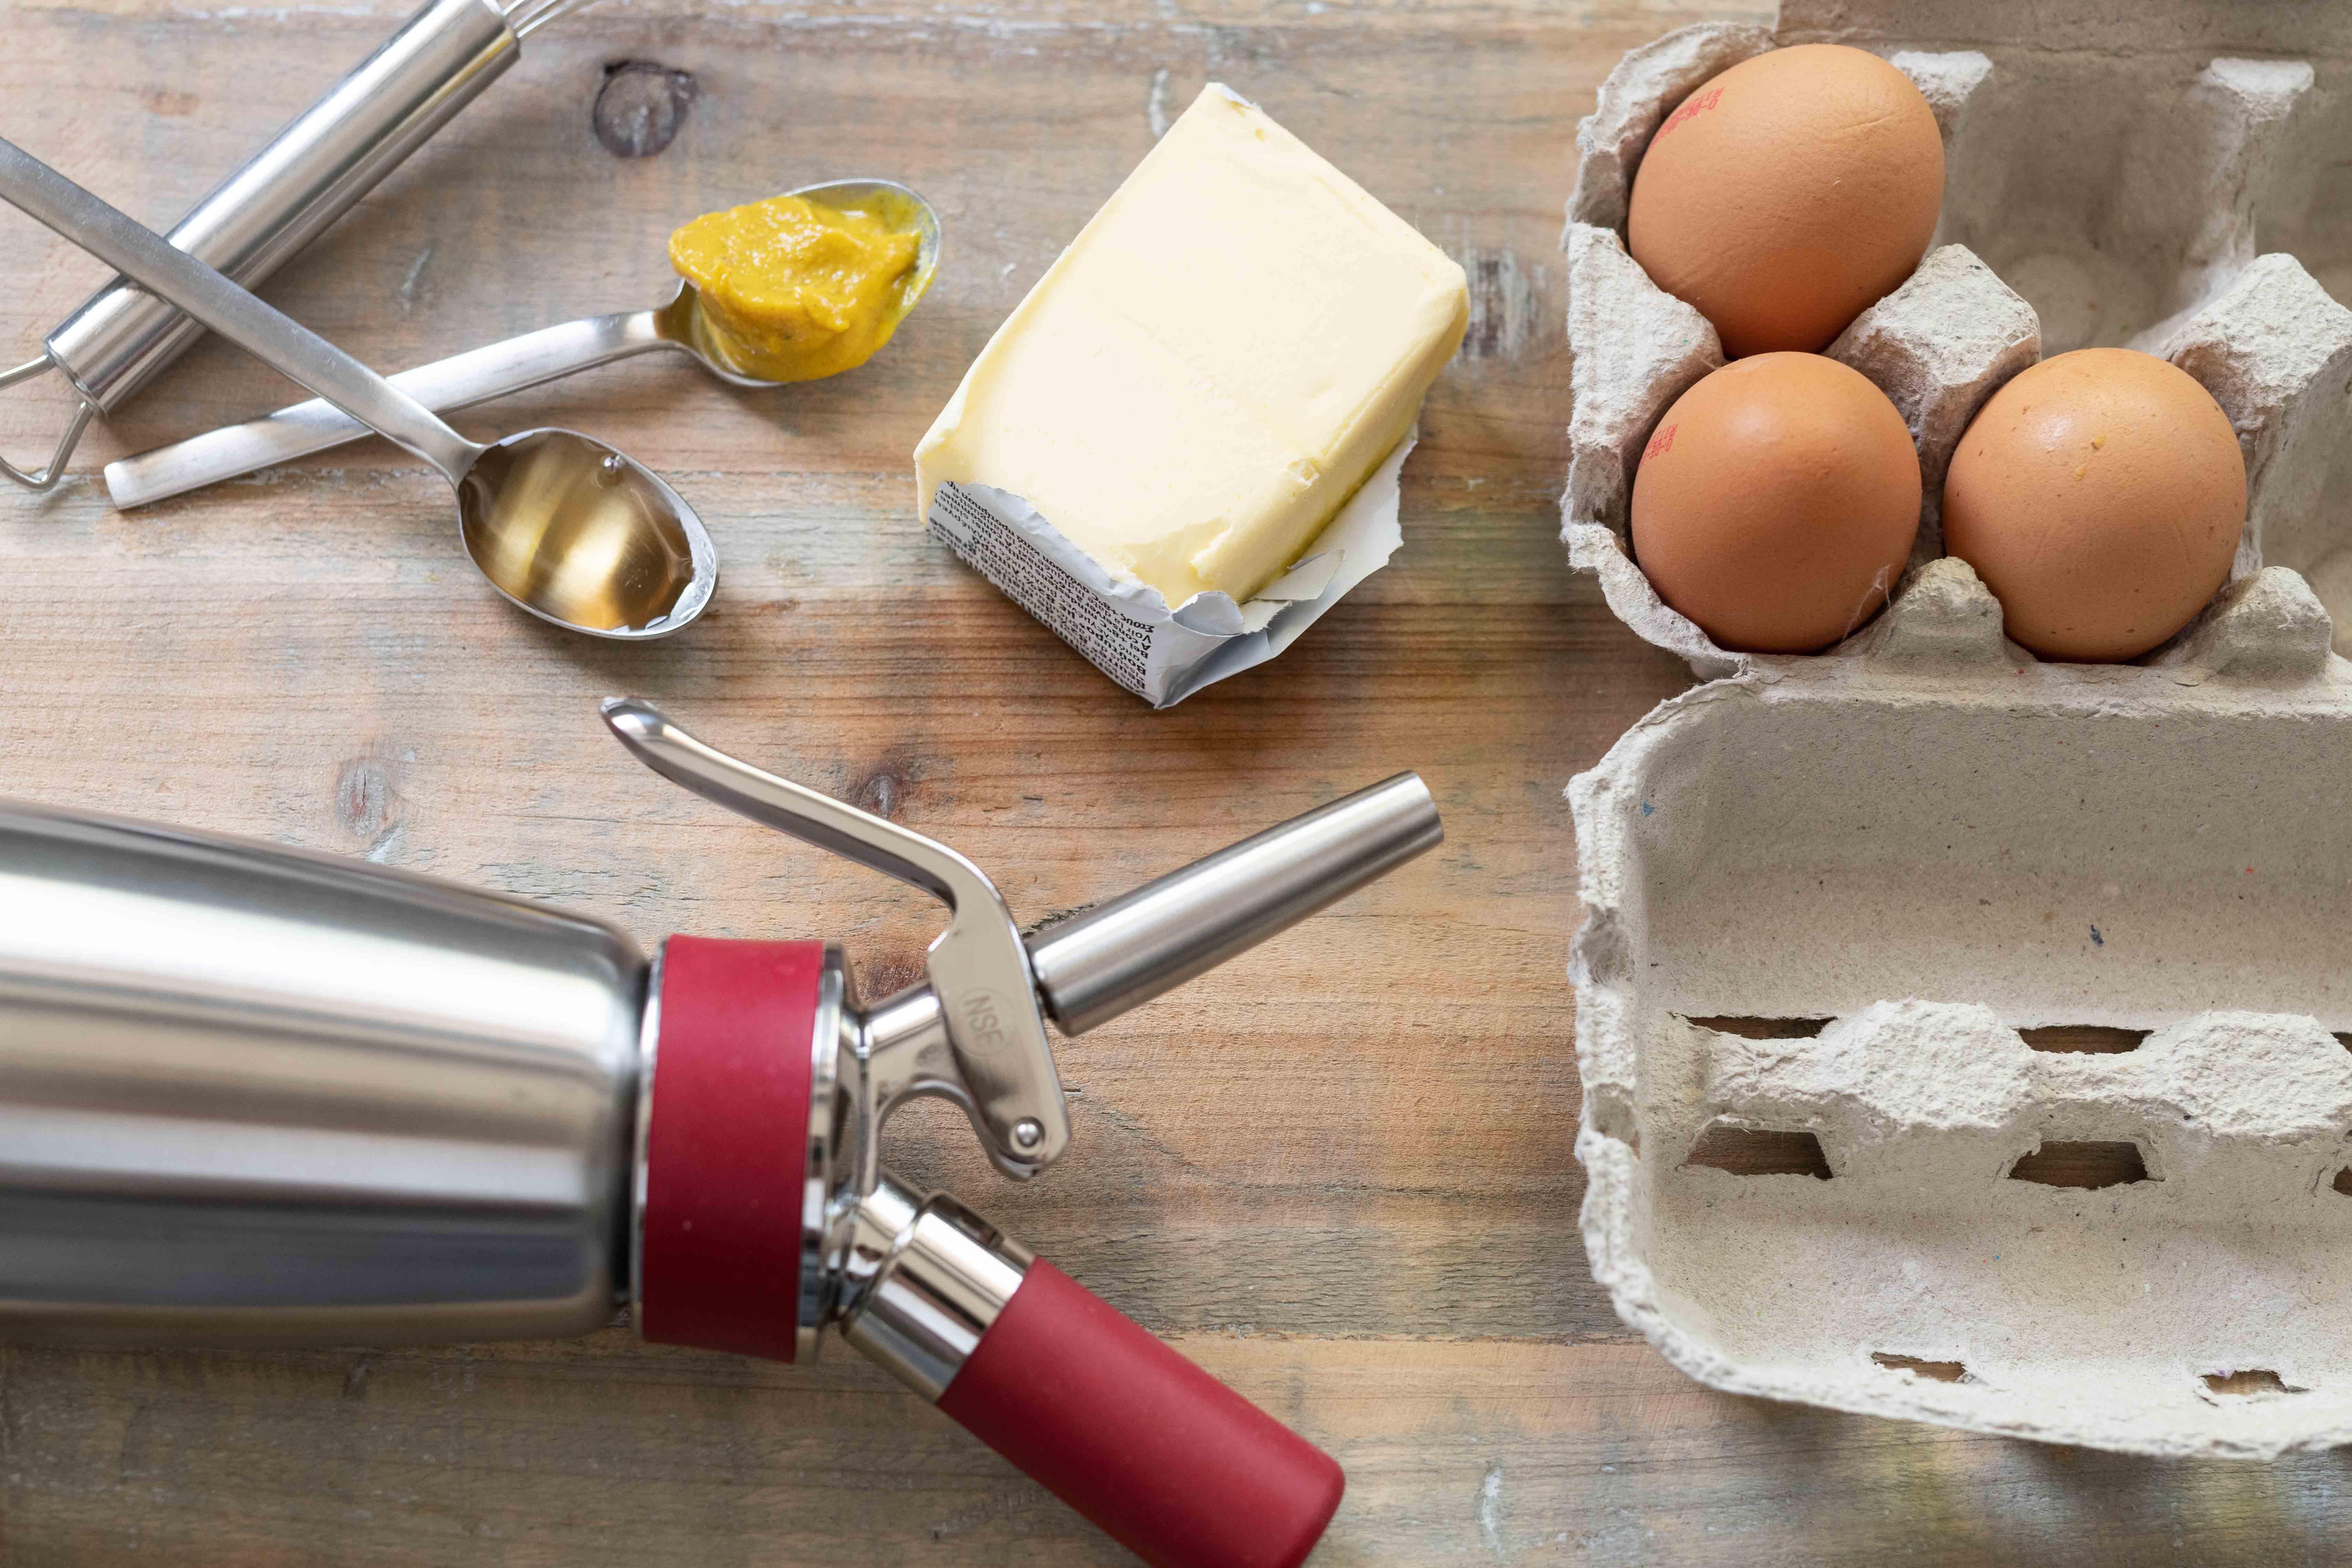 iSi Gourmet Whip Sauce hollandaise